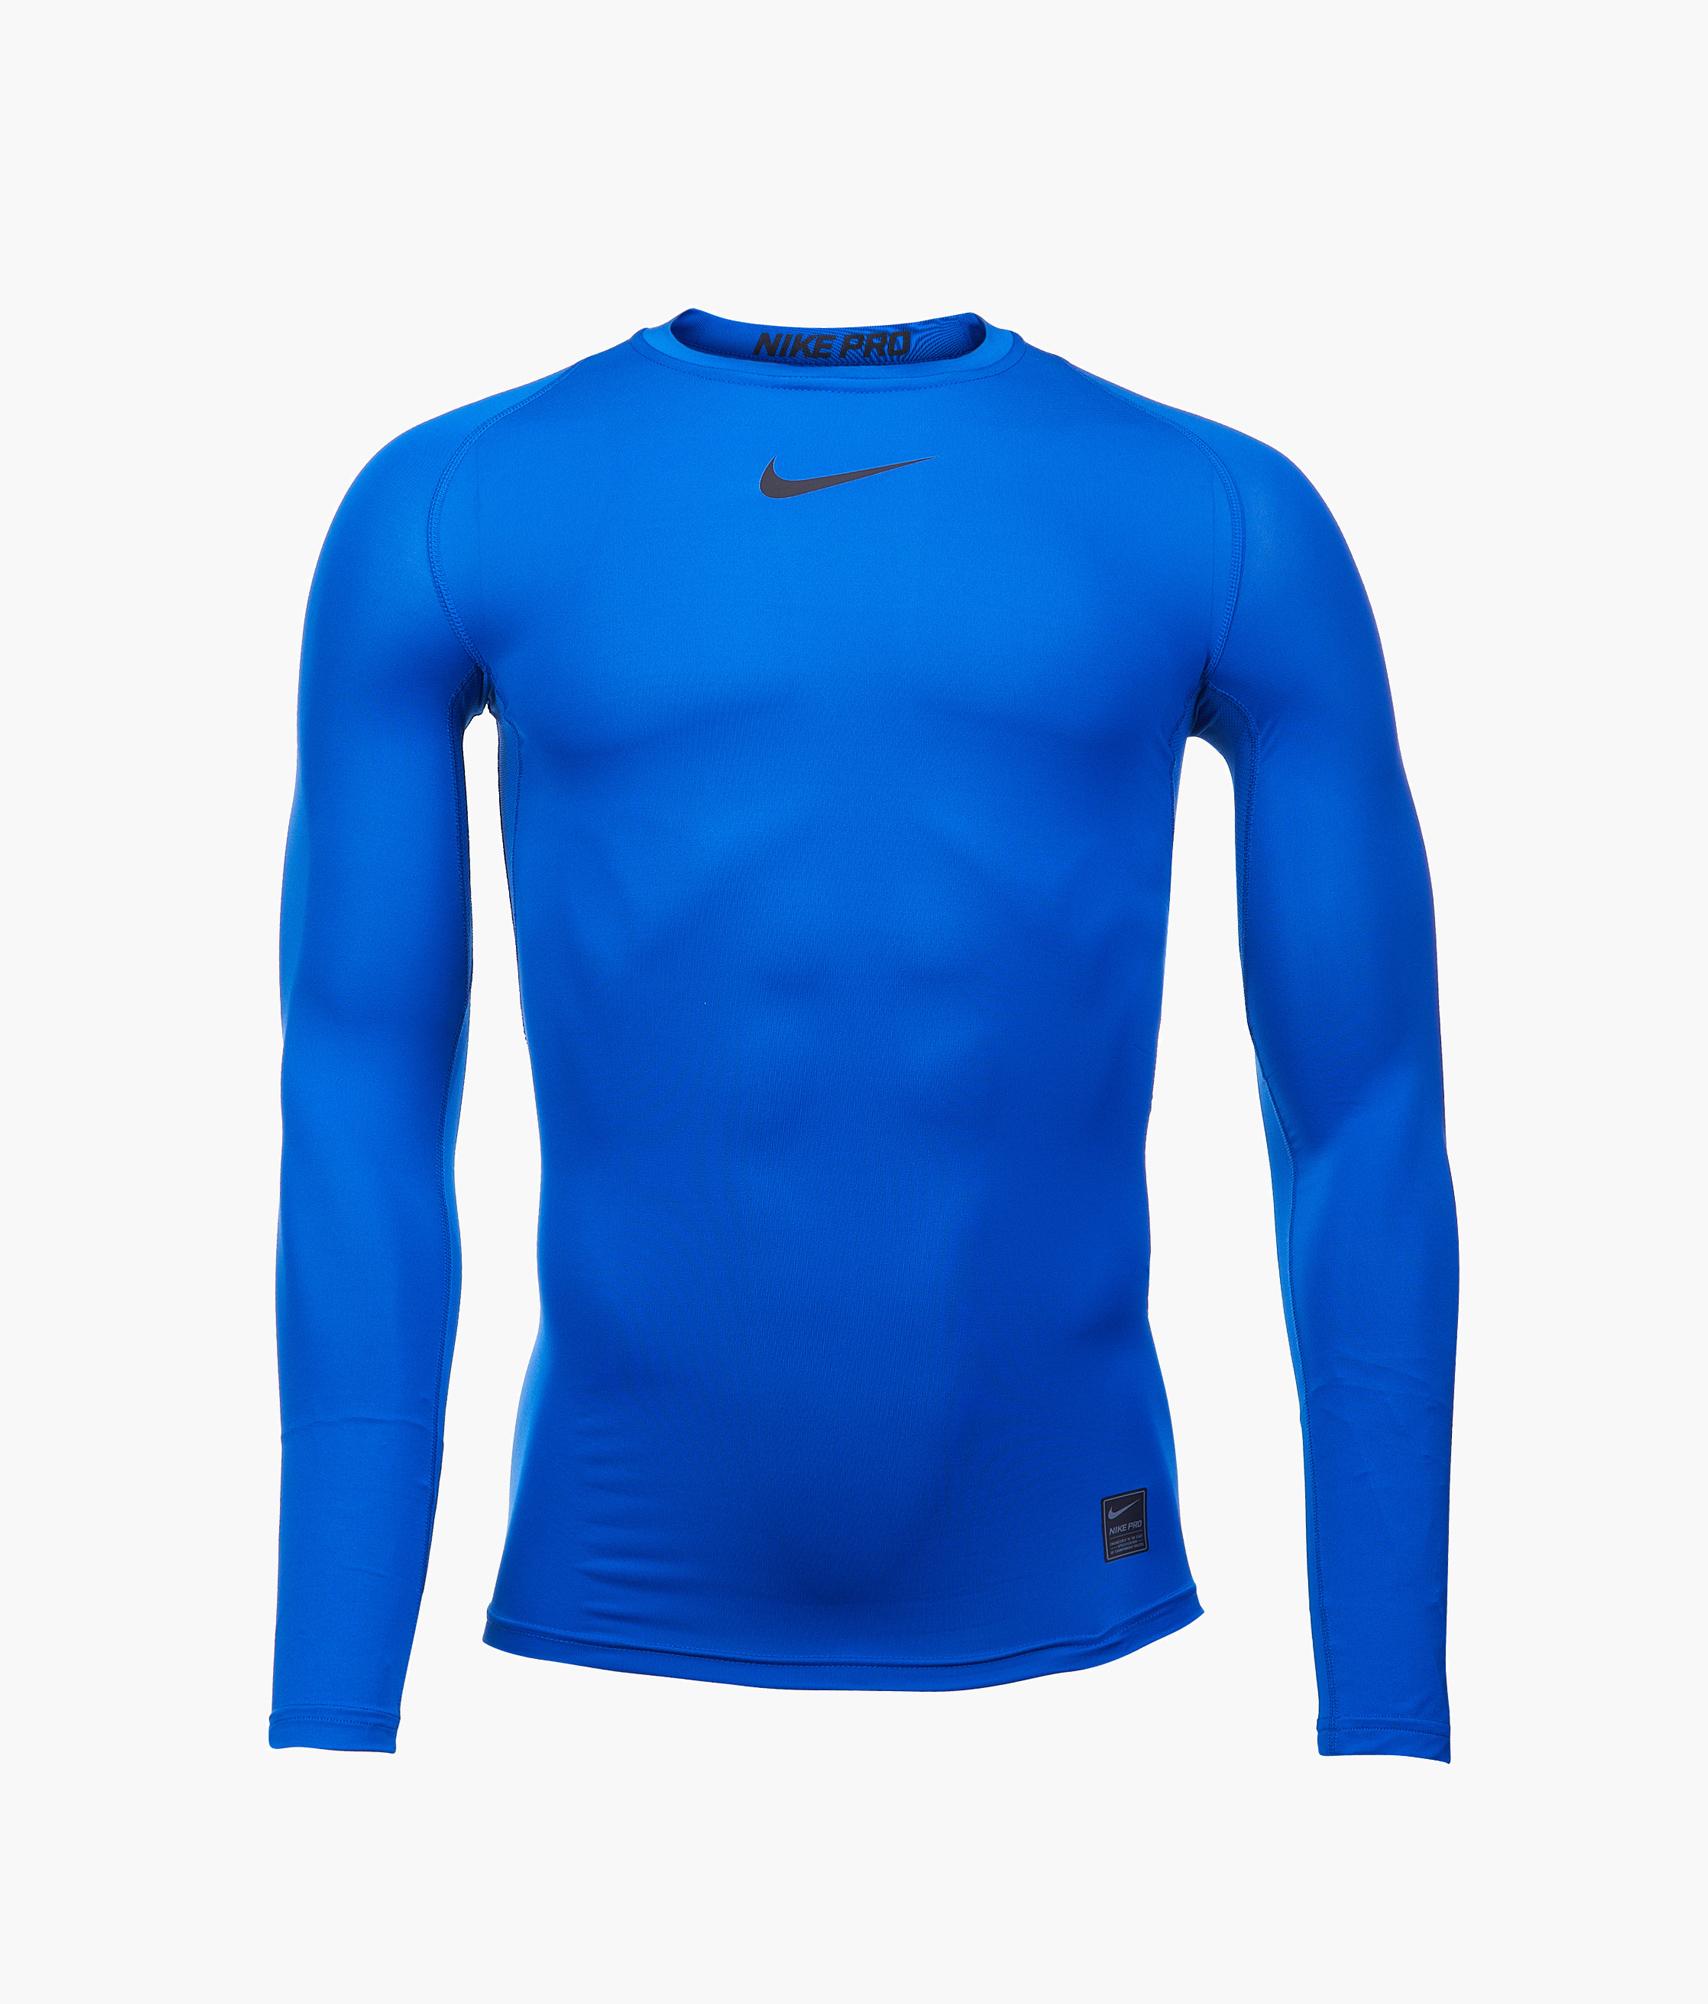 Бельё футболка Nike Зенит нижнее бельё